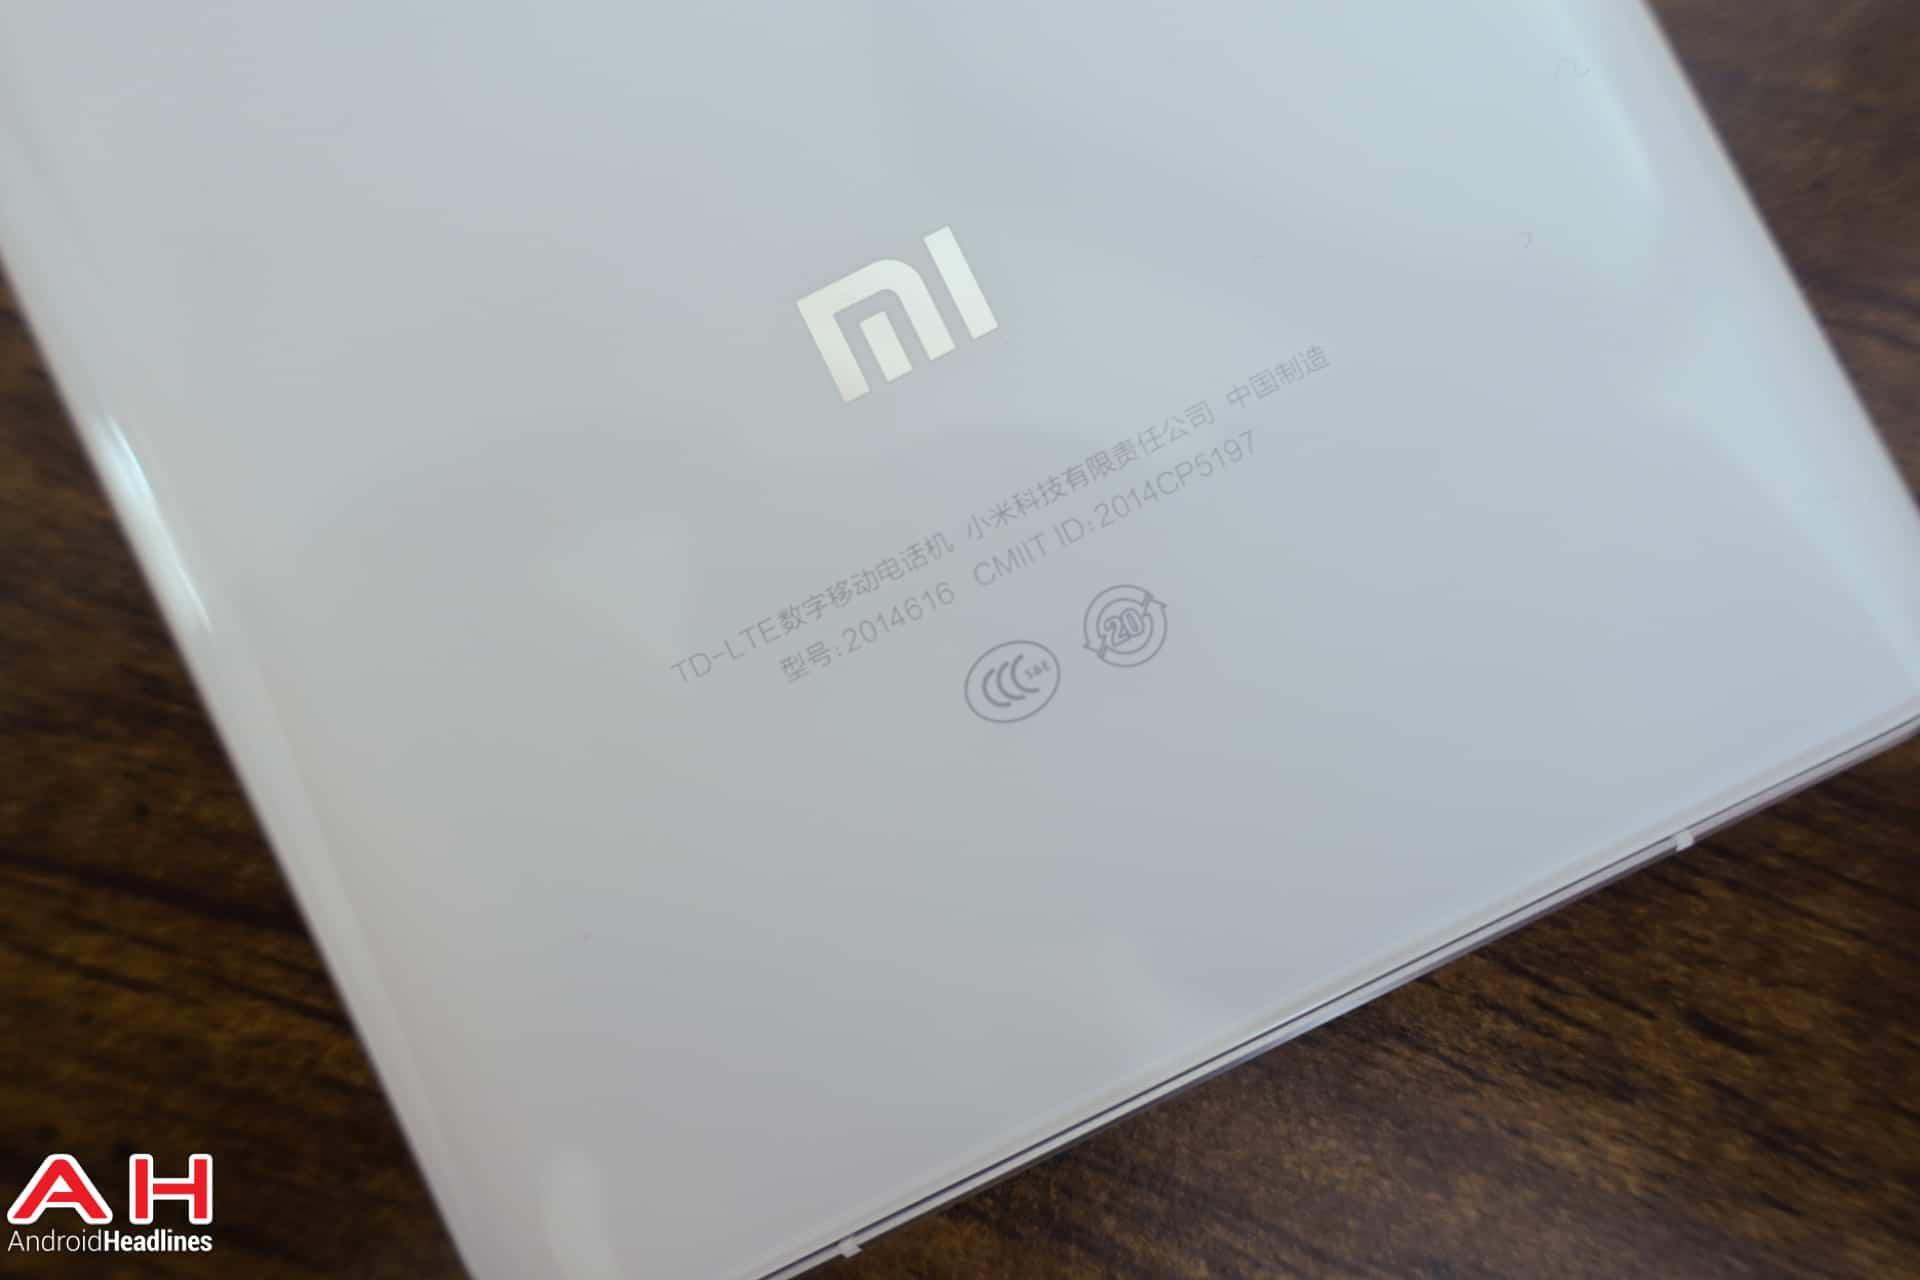 Xiaomi Mi Note AH 03770